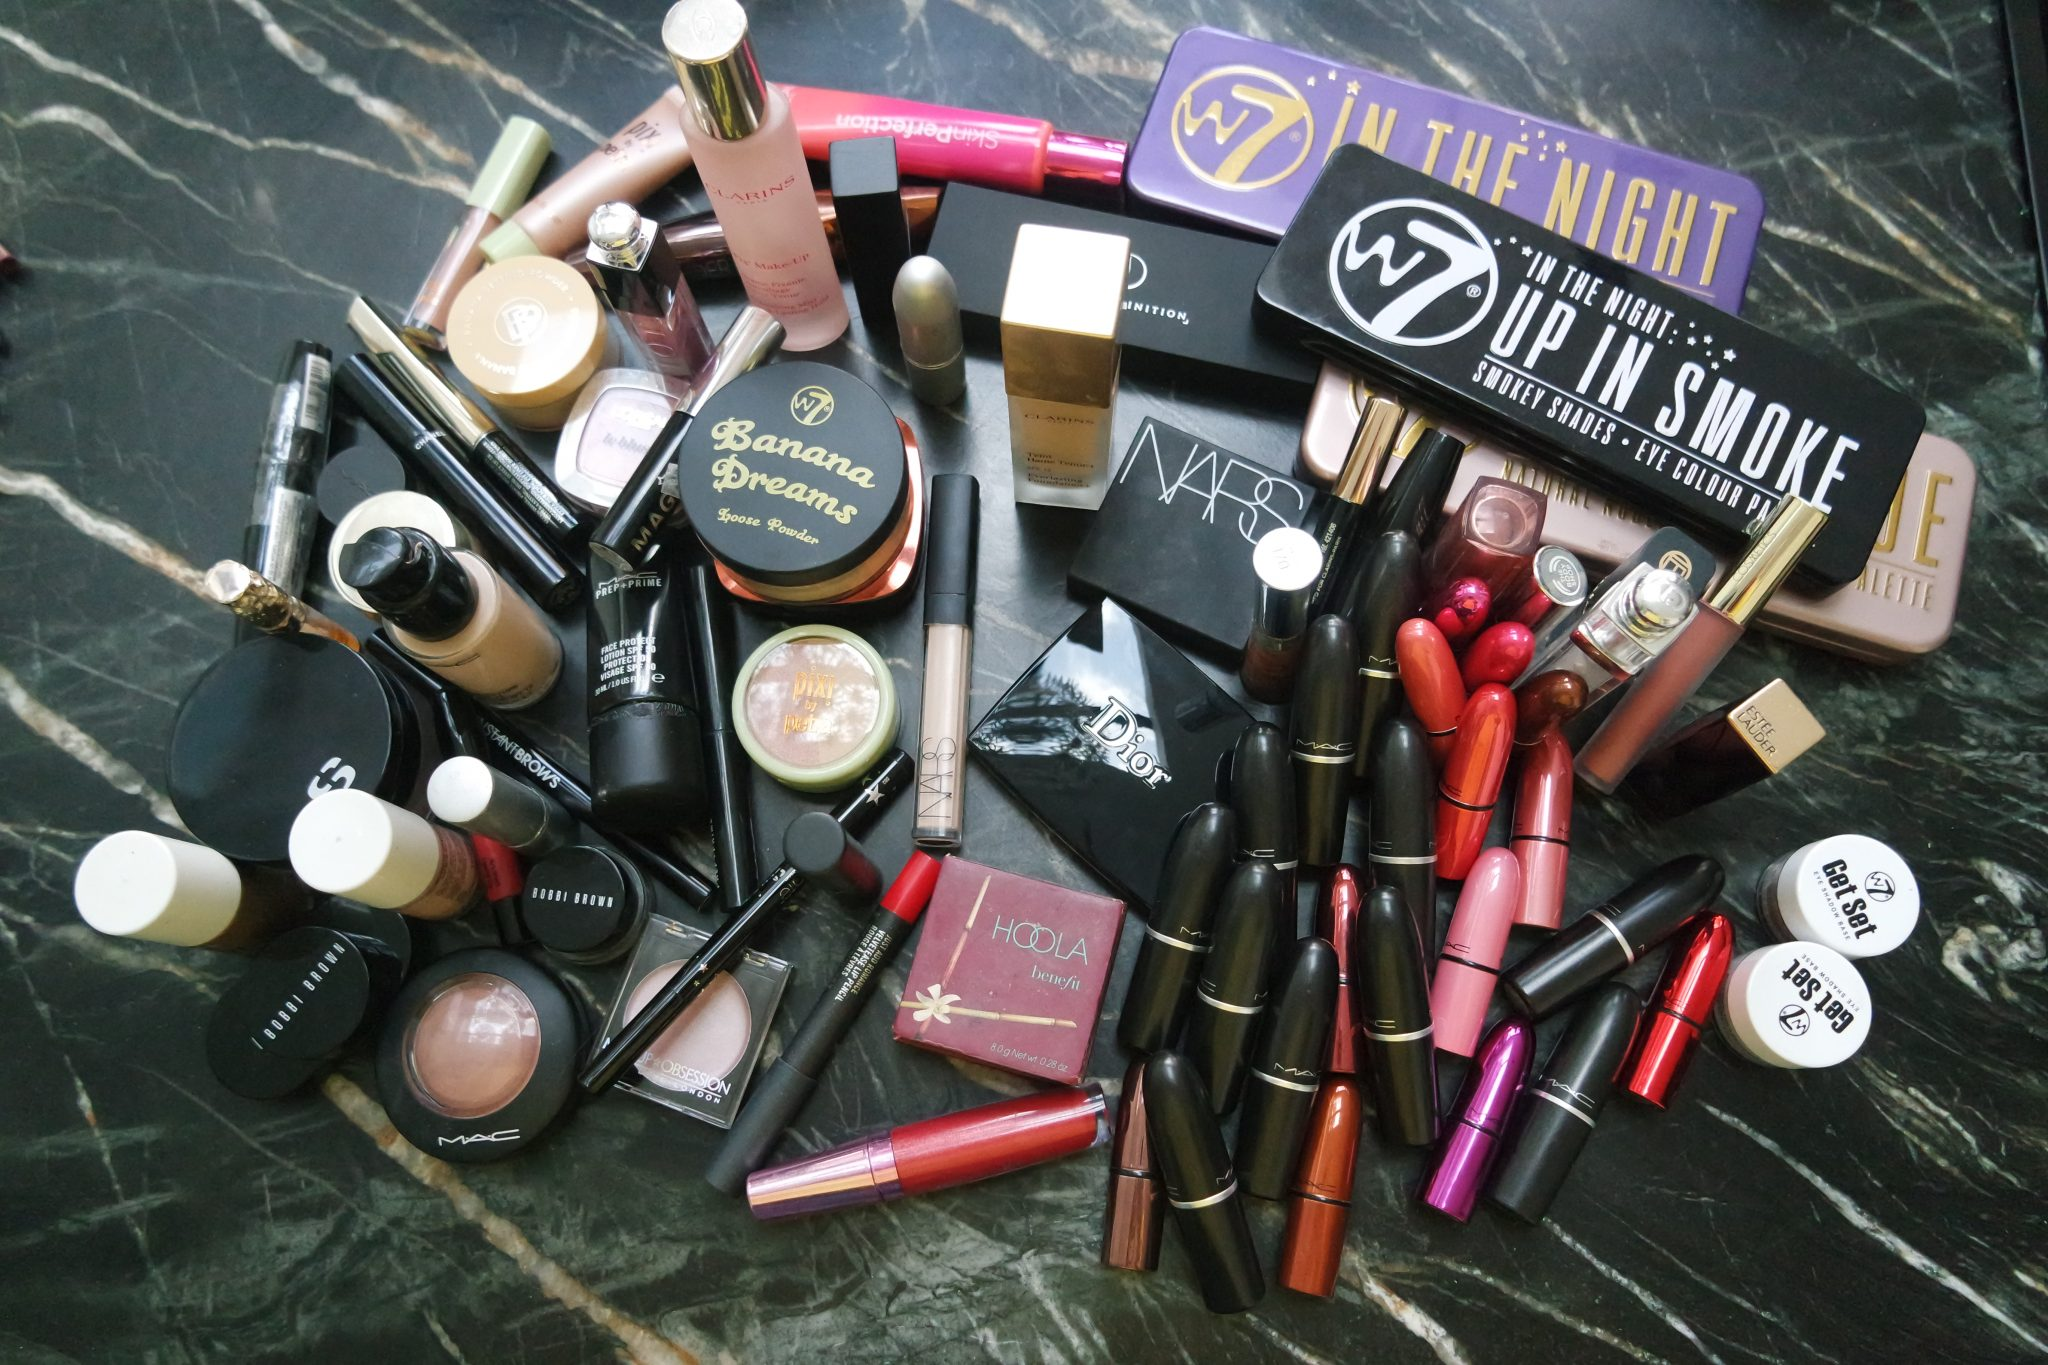 dierproefvrij make up stash